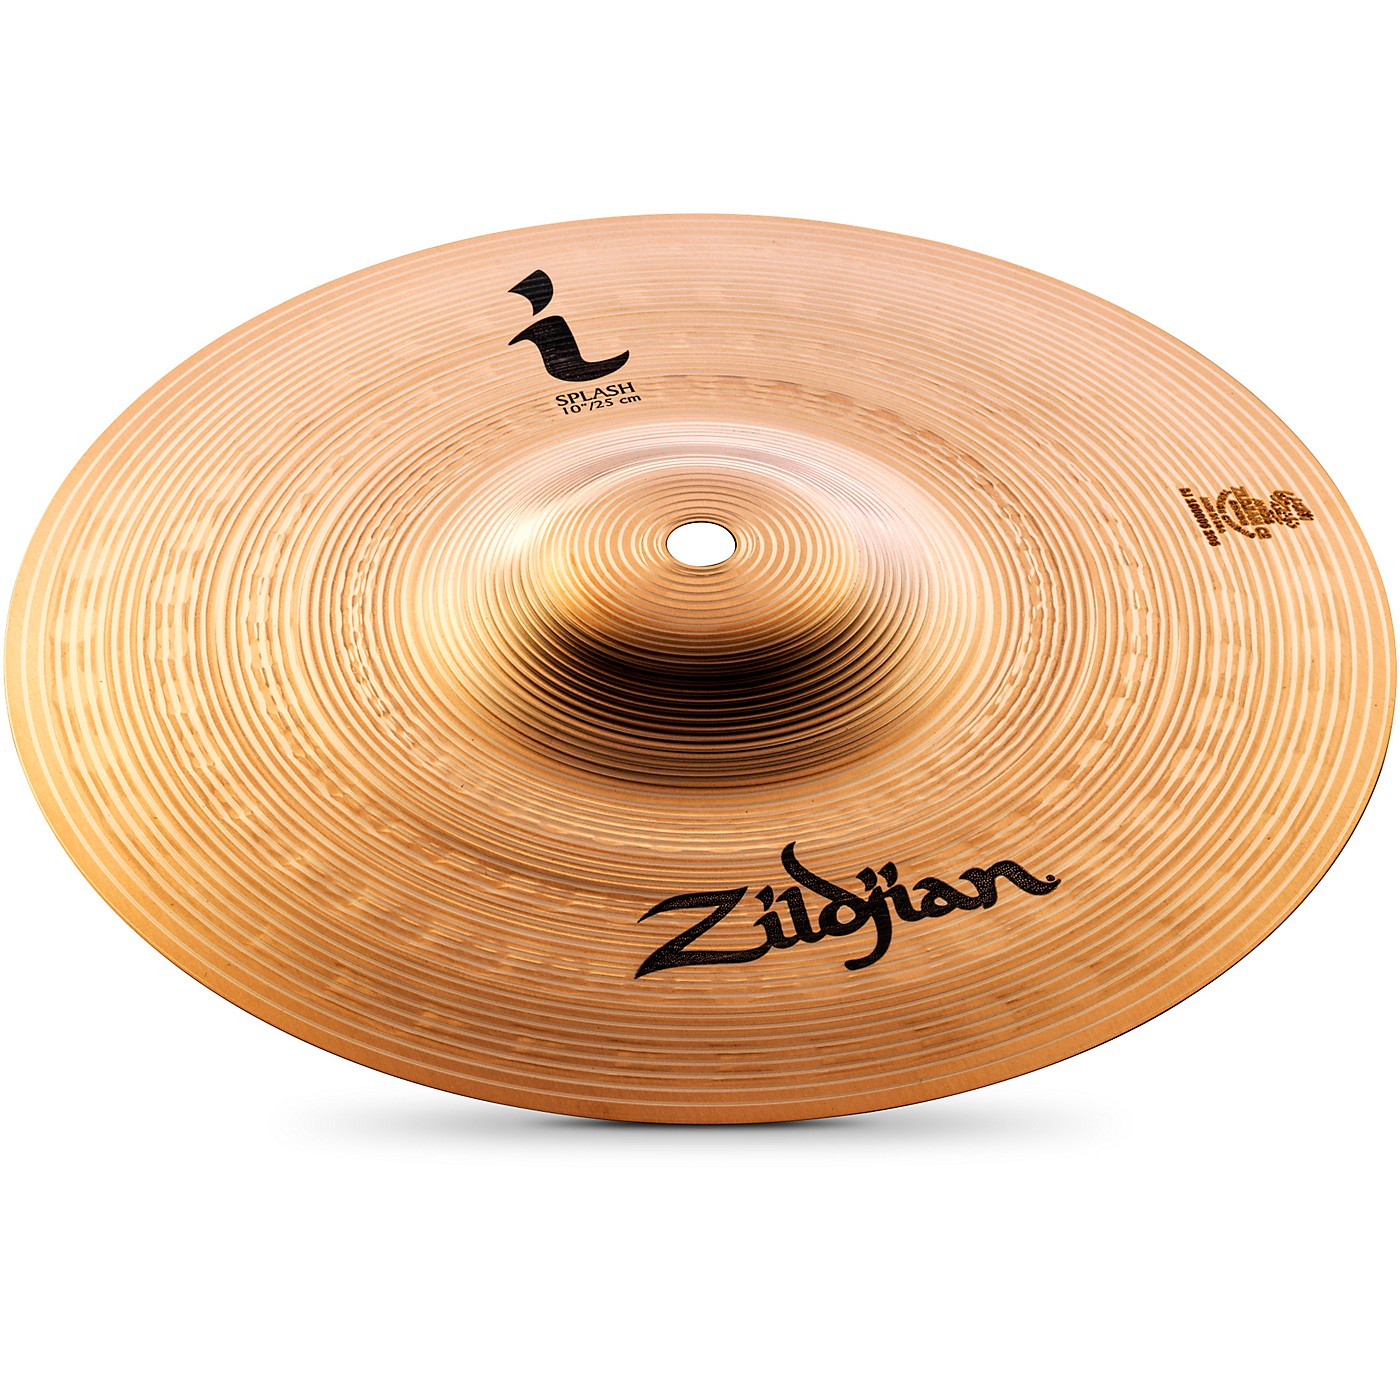 Zildjian I Series Splash Cymbal thumbnail